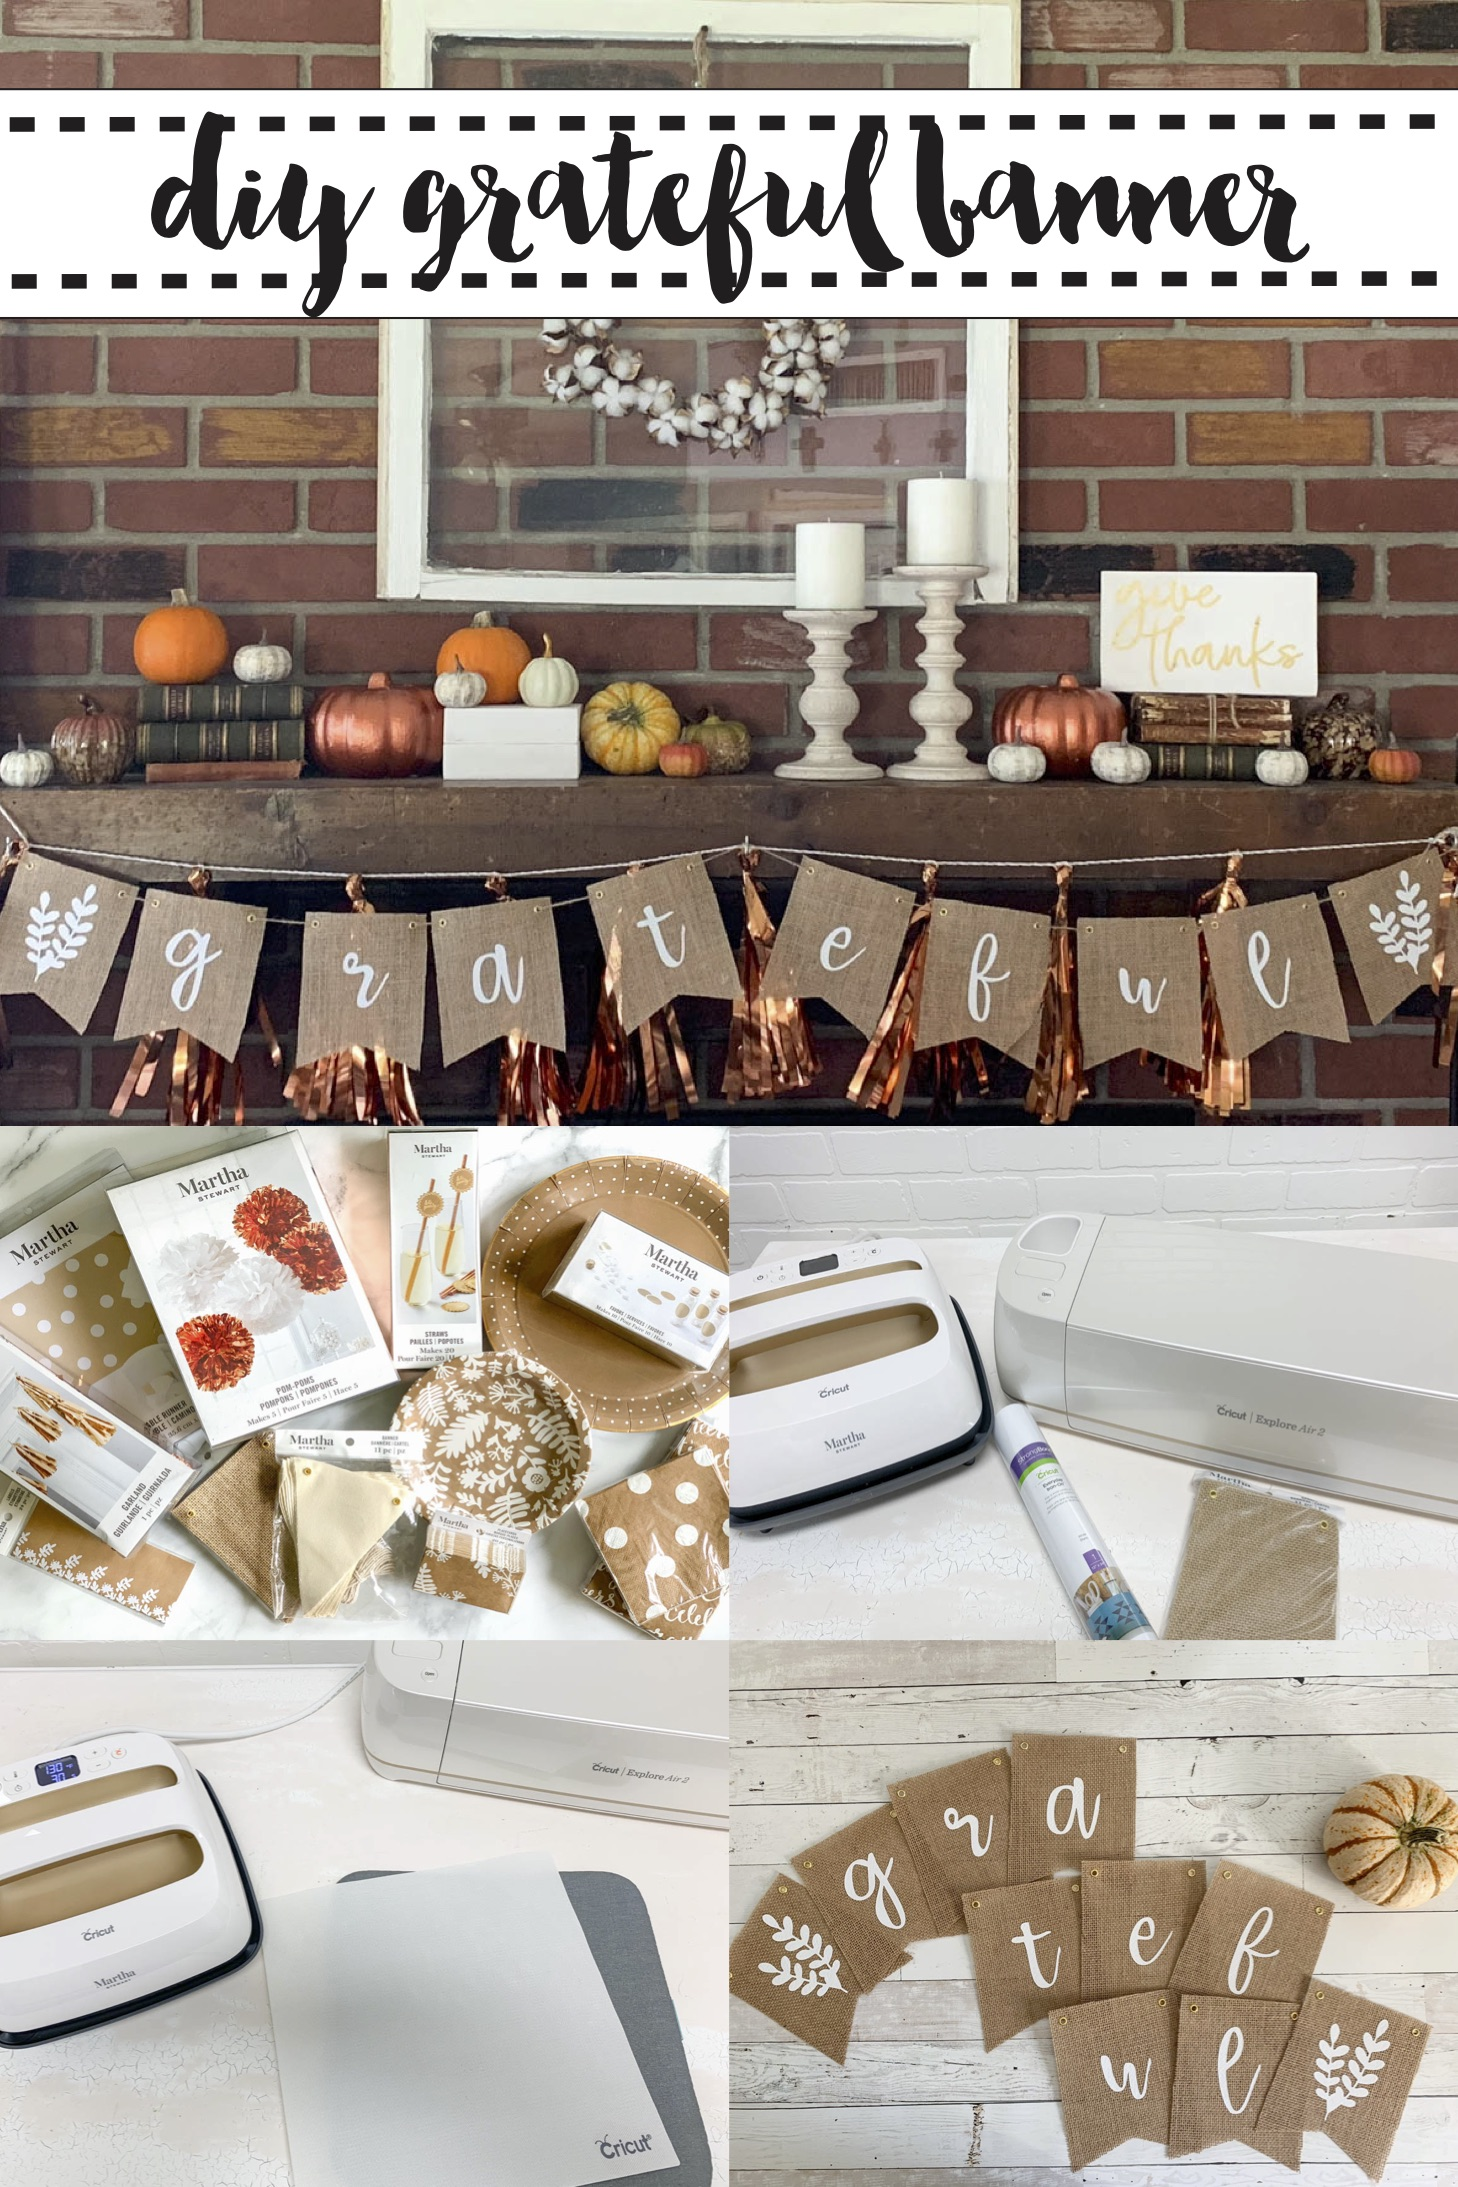 Grateful Banner DIY Collage